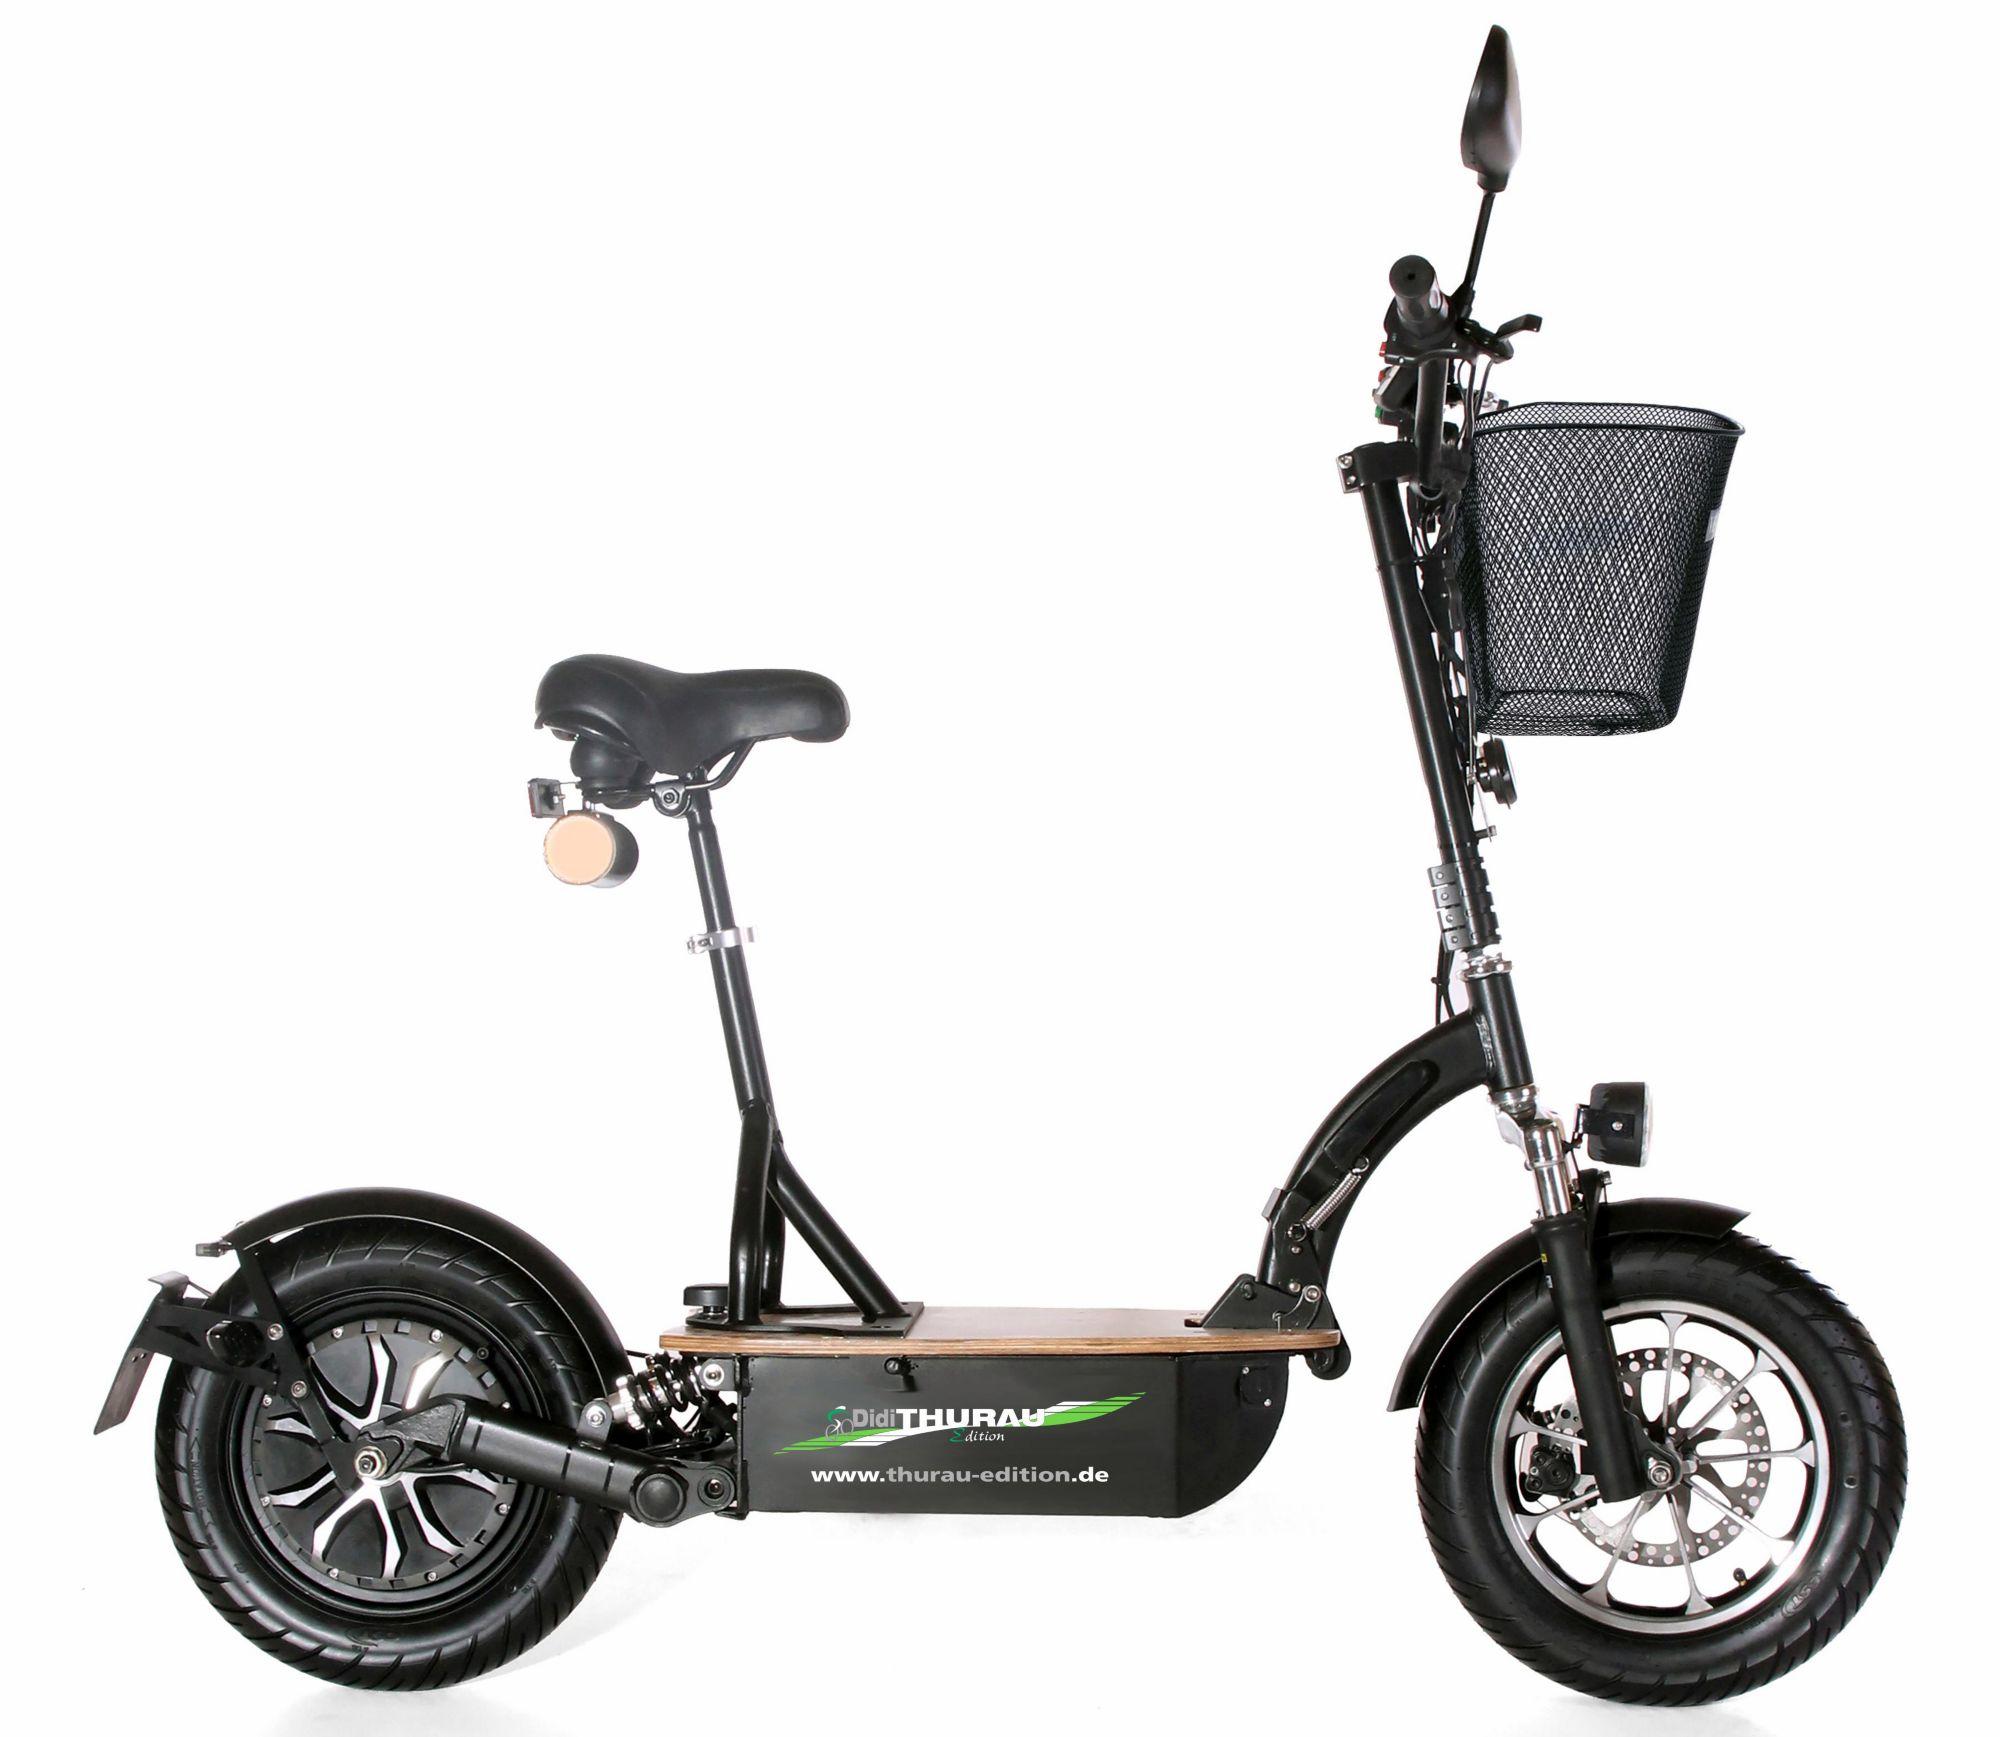 DIDI THURAU EDITION Didi Thurau Edition Elektro-Roller Eco-Tourer Speed, 45 km/h, »Basic«